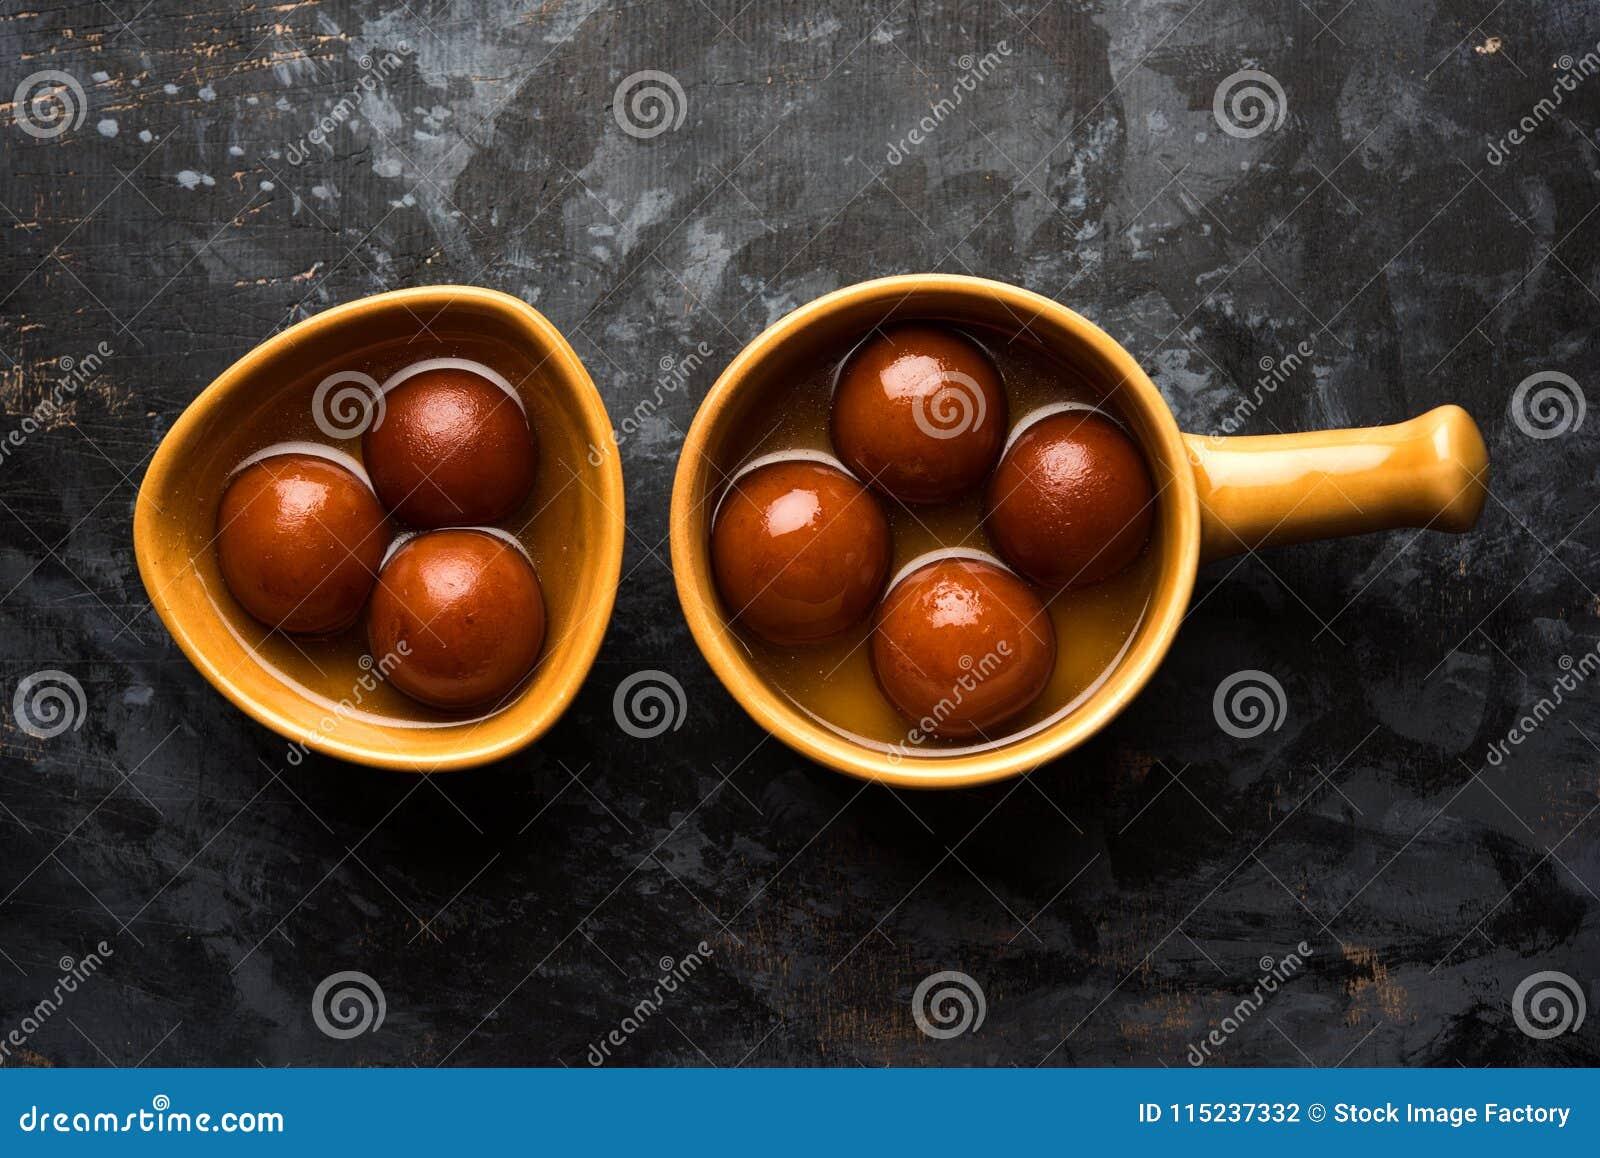 Indian sweet Gulab Jamun served in a ceramic bowl, selective focus